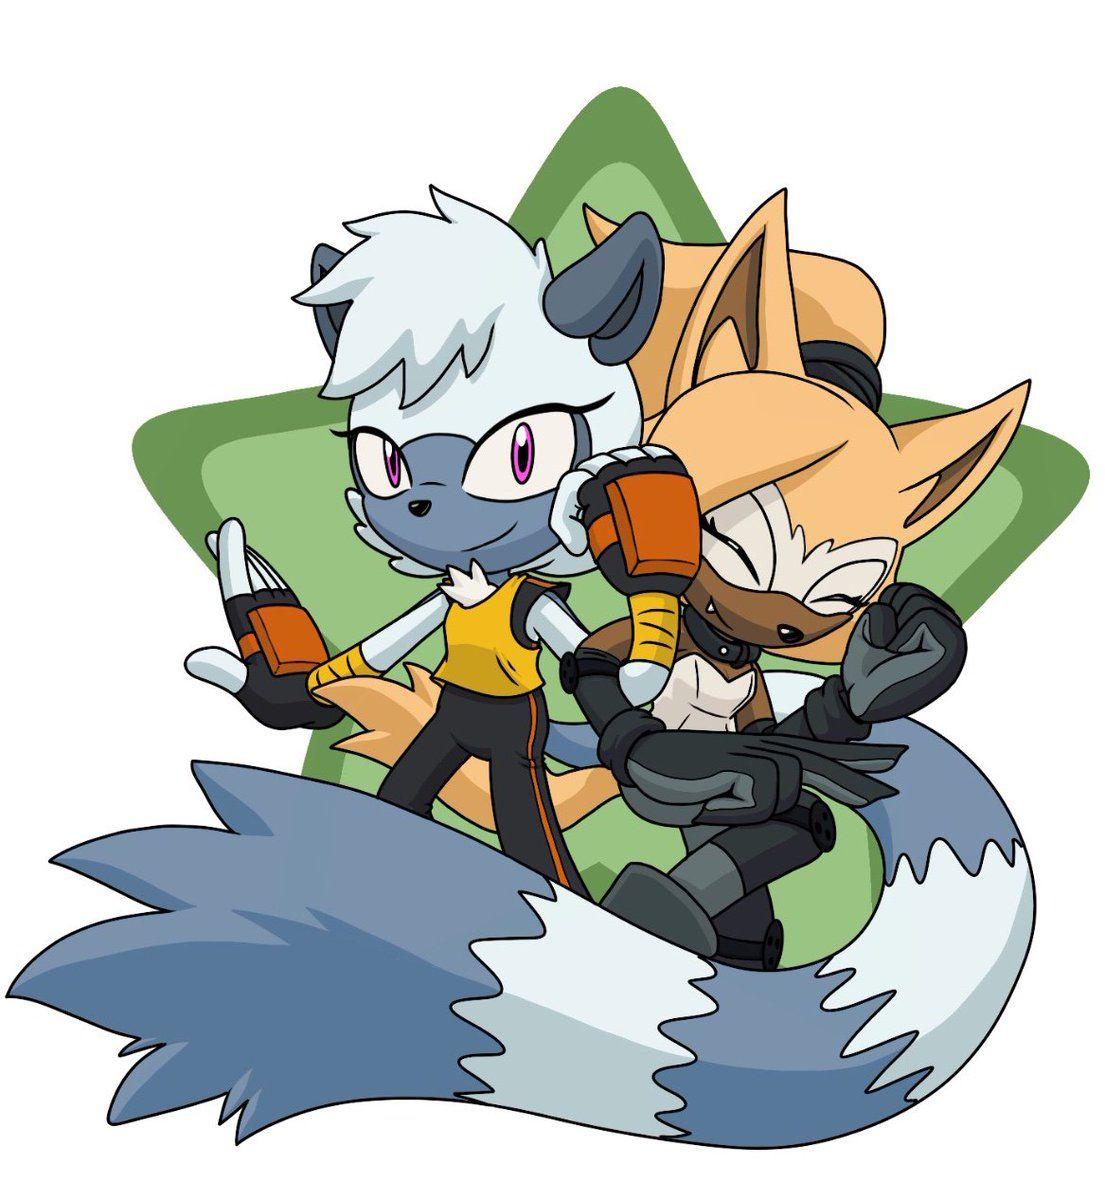 Idea by Tangle The Lemur on Tangle The Lemur Sonic art